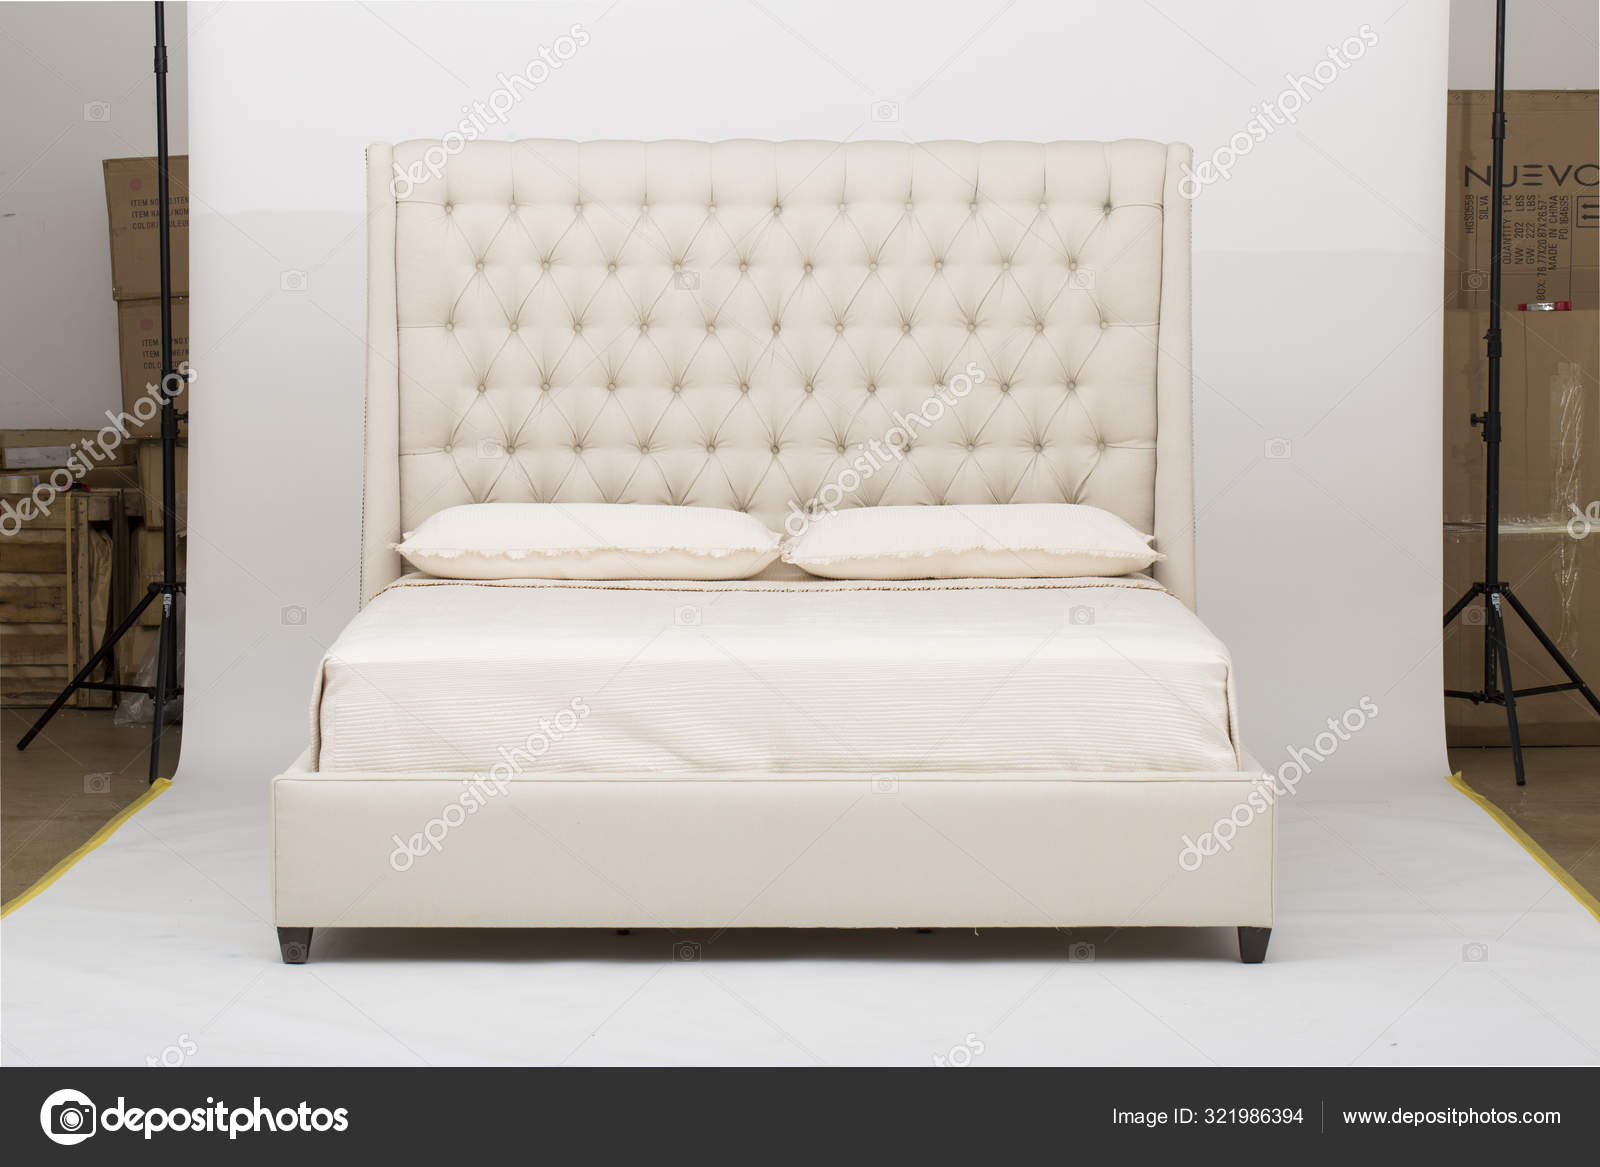 Sheet Set White Sheet Sets Sheets Pillow Cases White Striped Bed Sheets Cotton Stock Photo C Jassdhiman 321986394